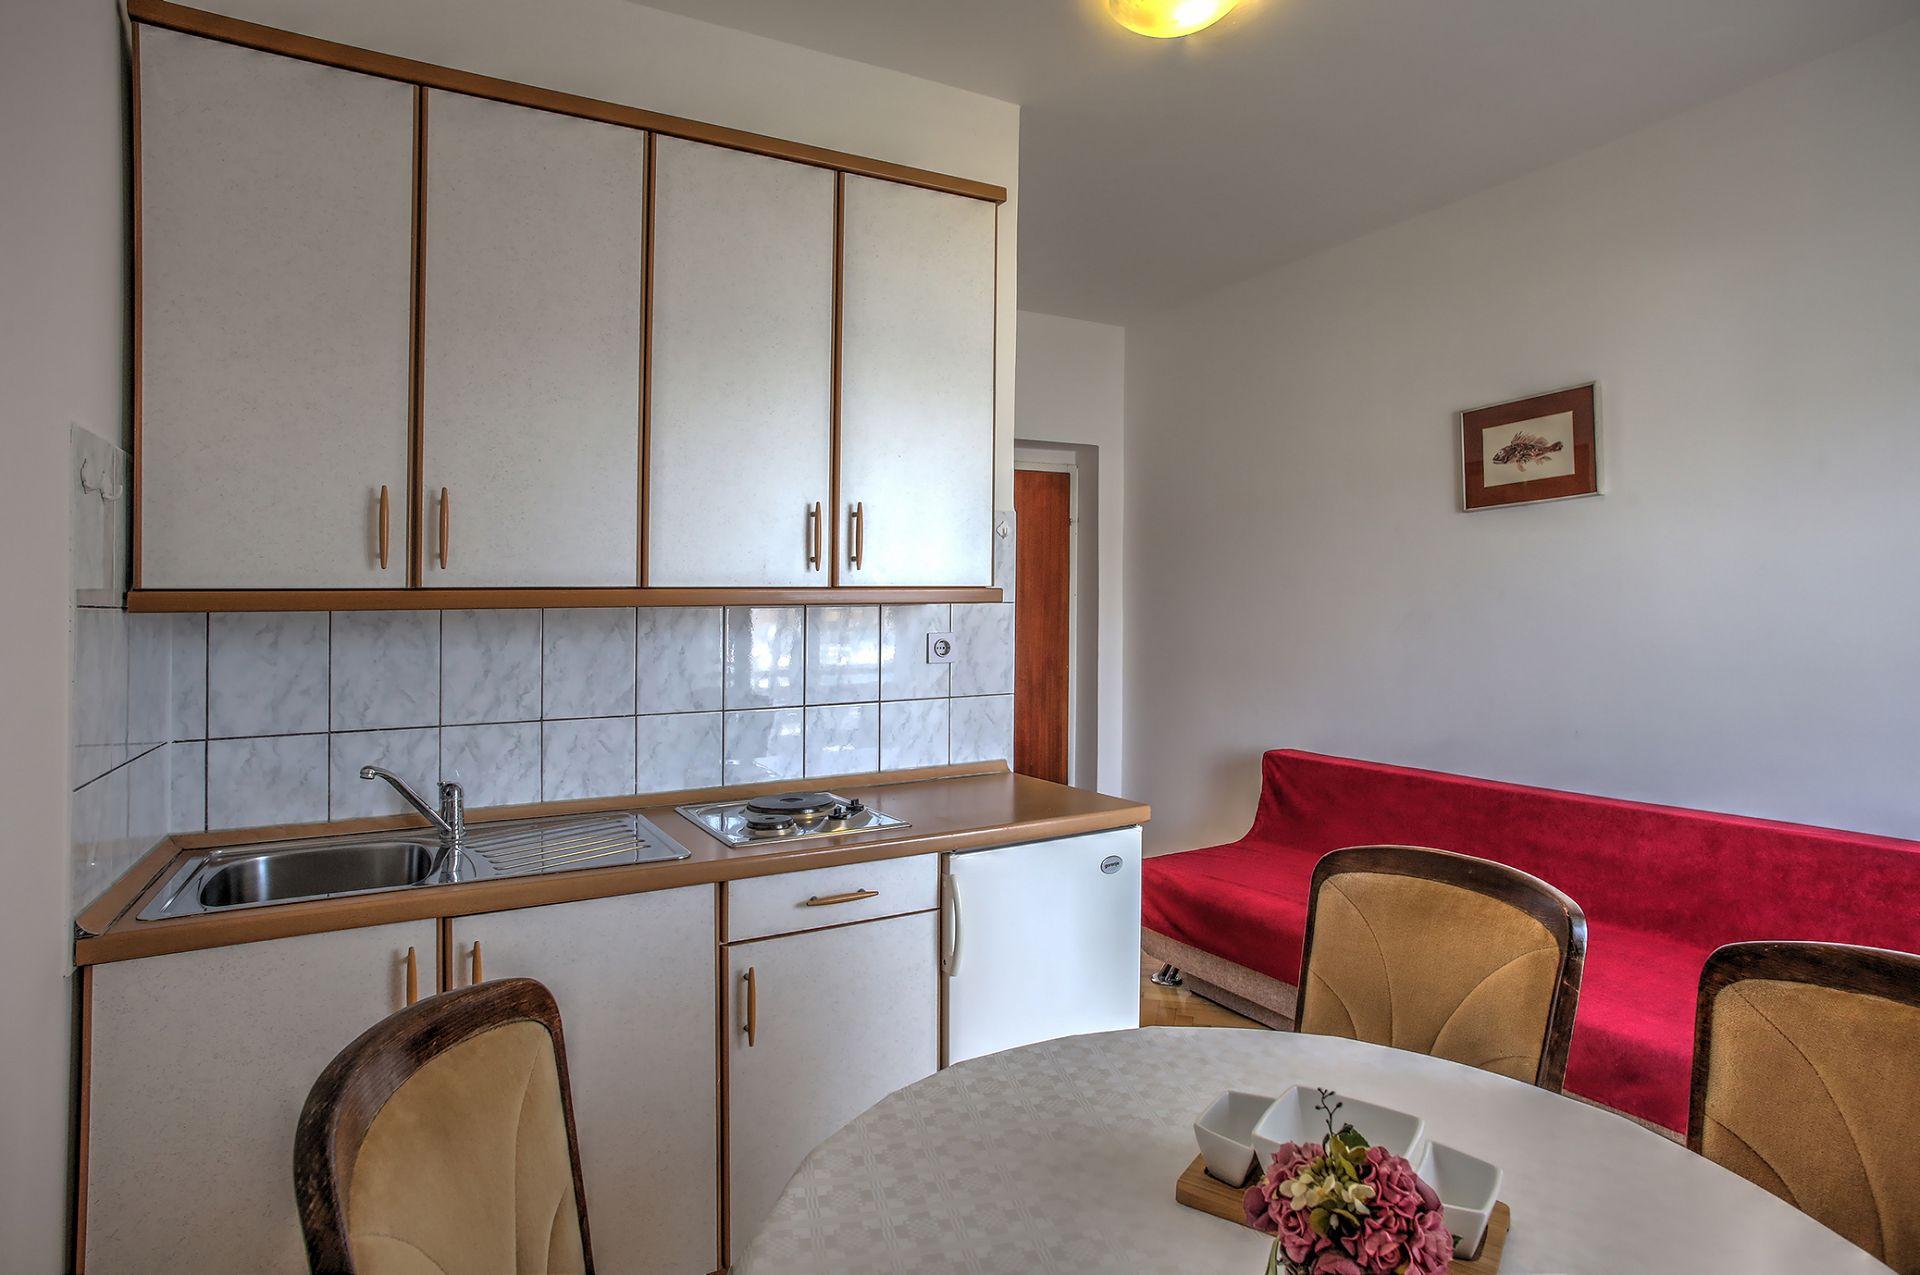 5409 - Jezera - Apartments Croatia - A1(2+1): kitchen and dining room